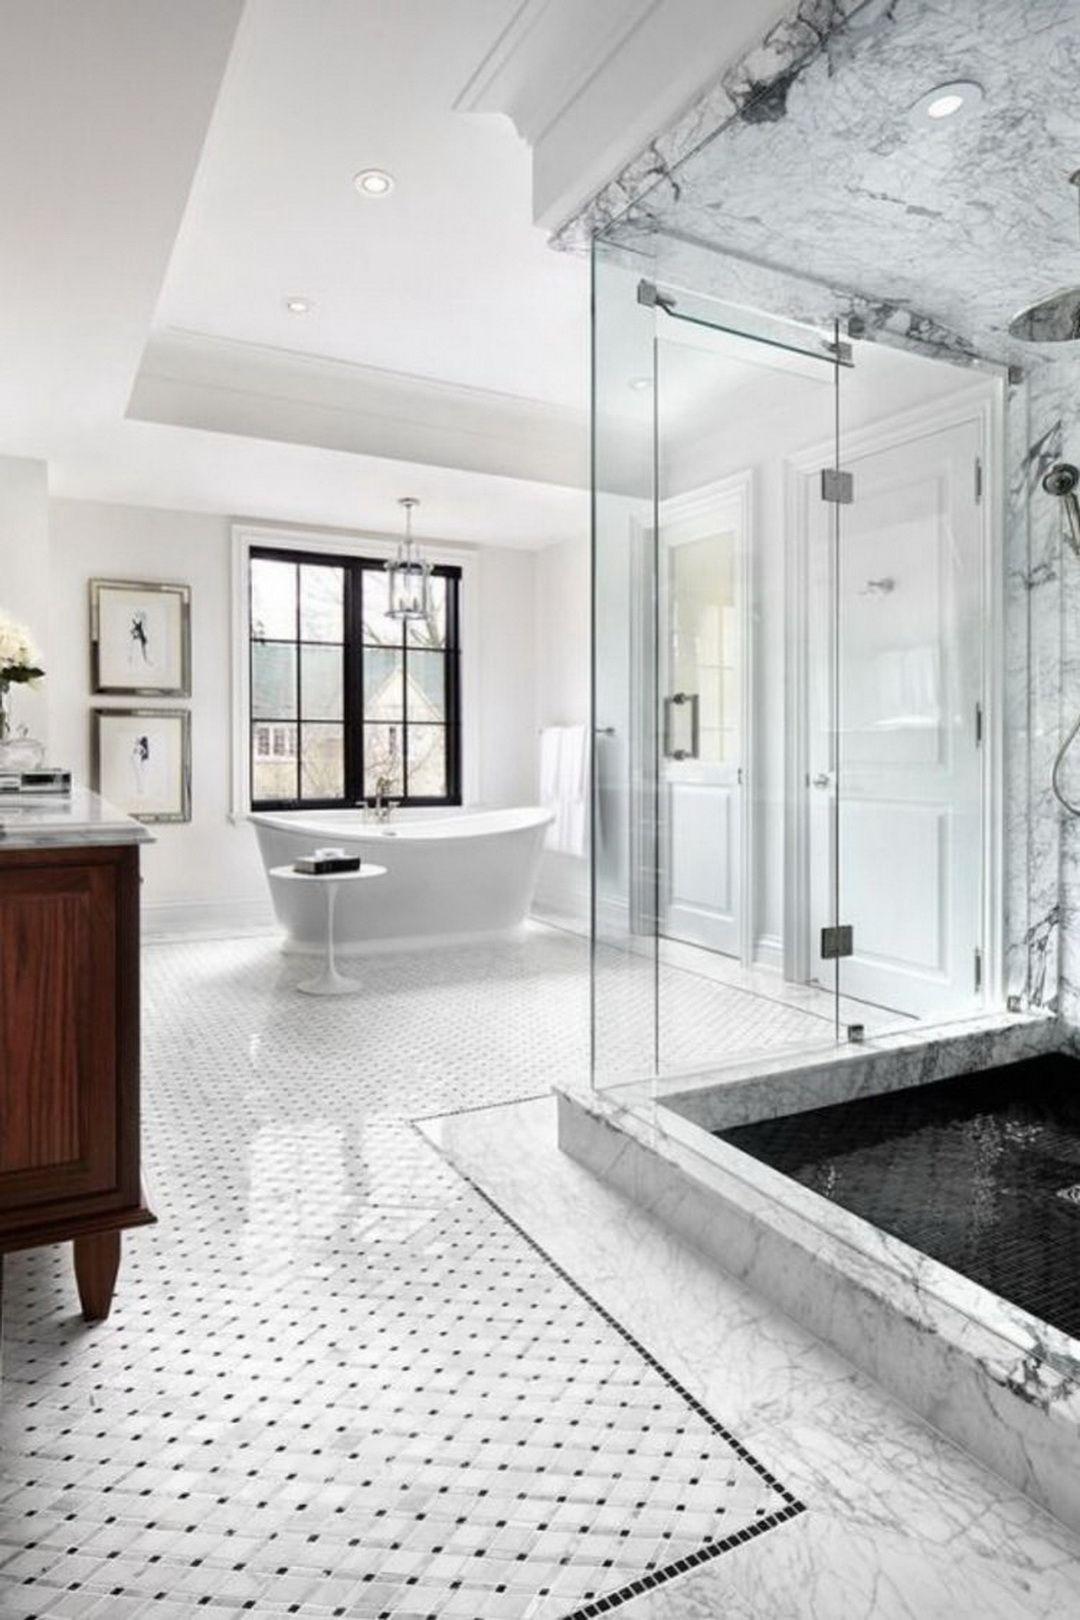 26 Trending Luxury Master-Bathroom Designs 🛀 | Pinterest | Master ...